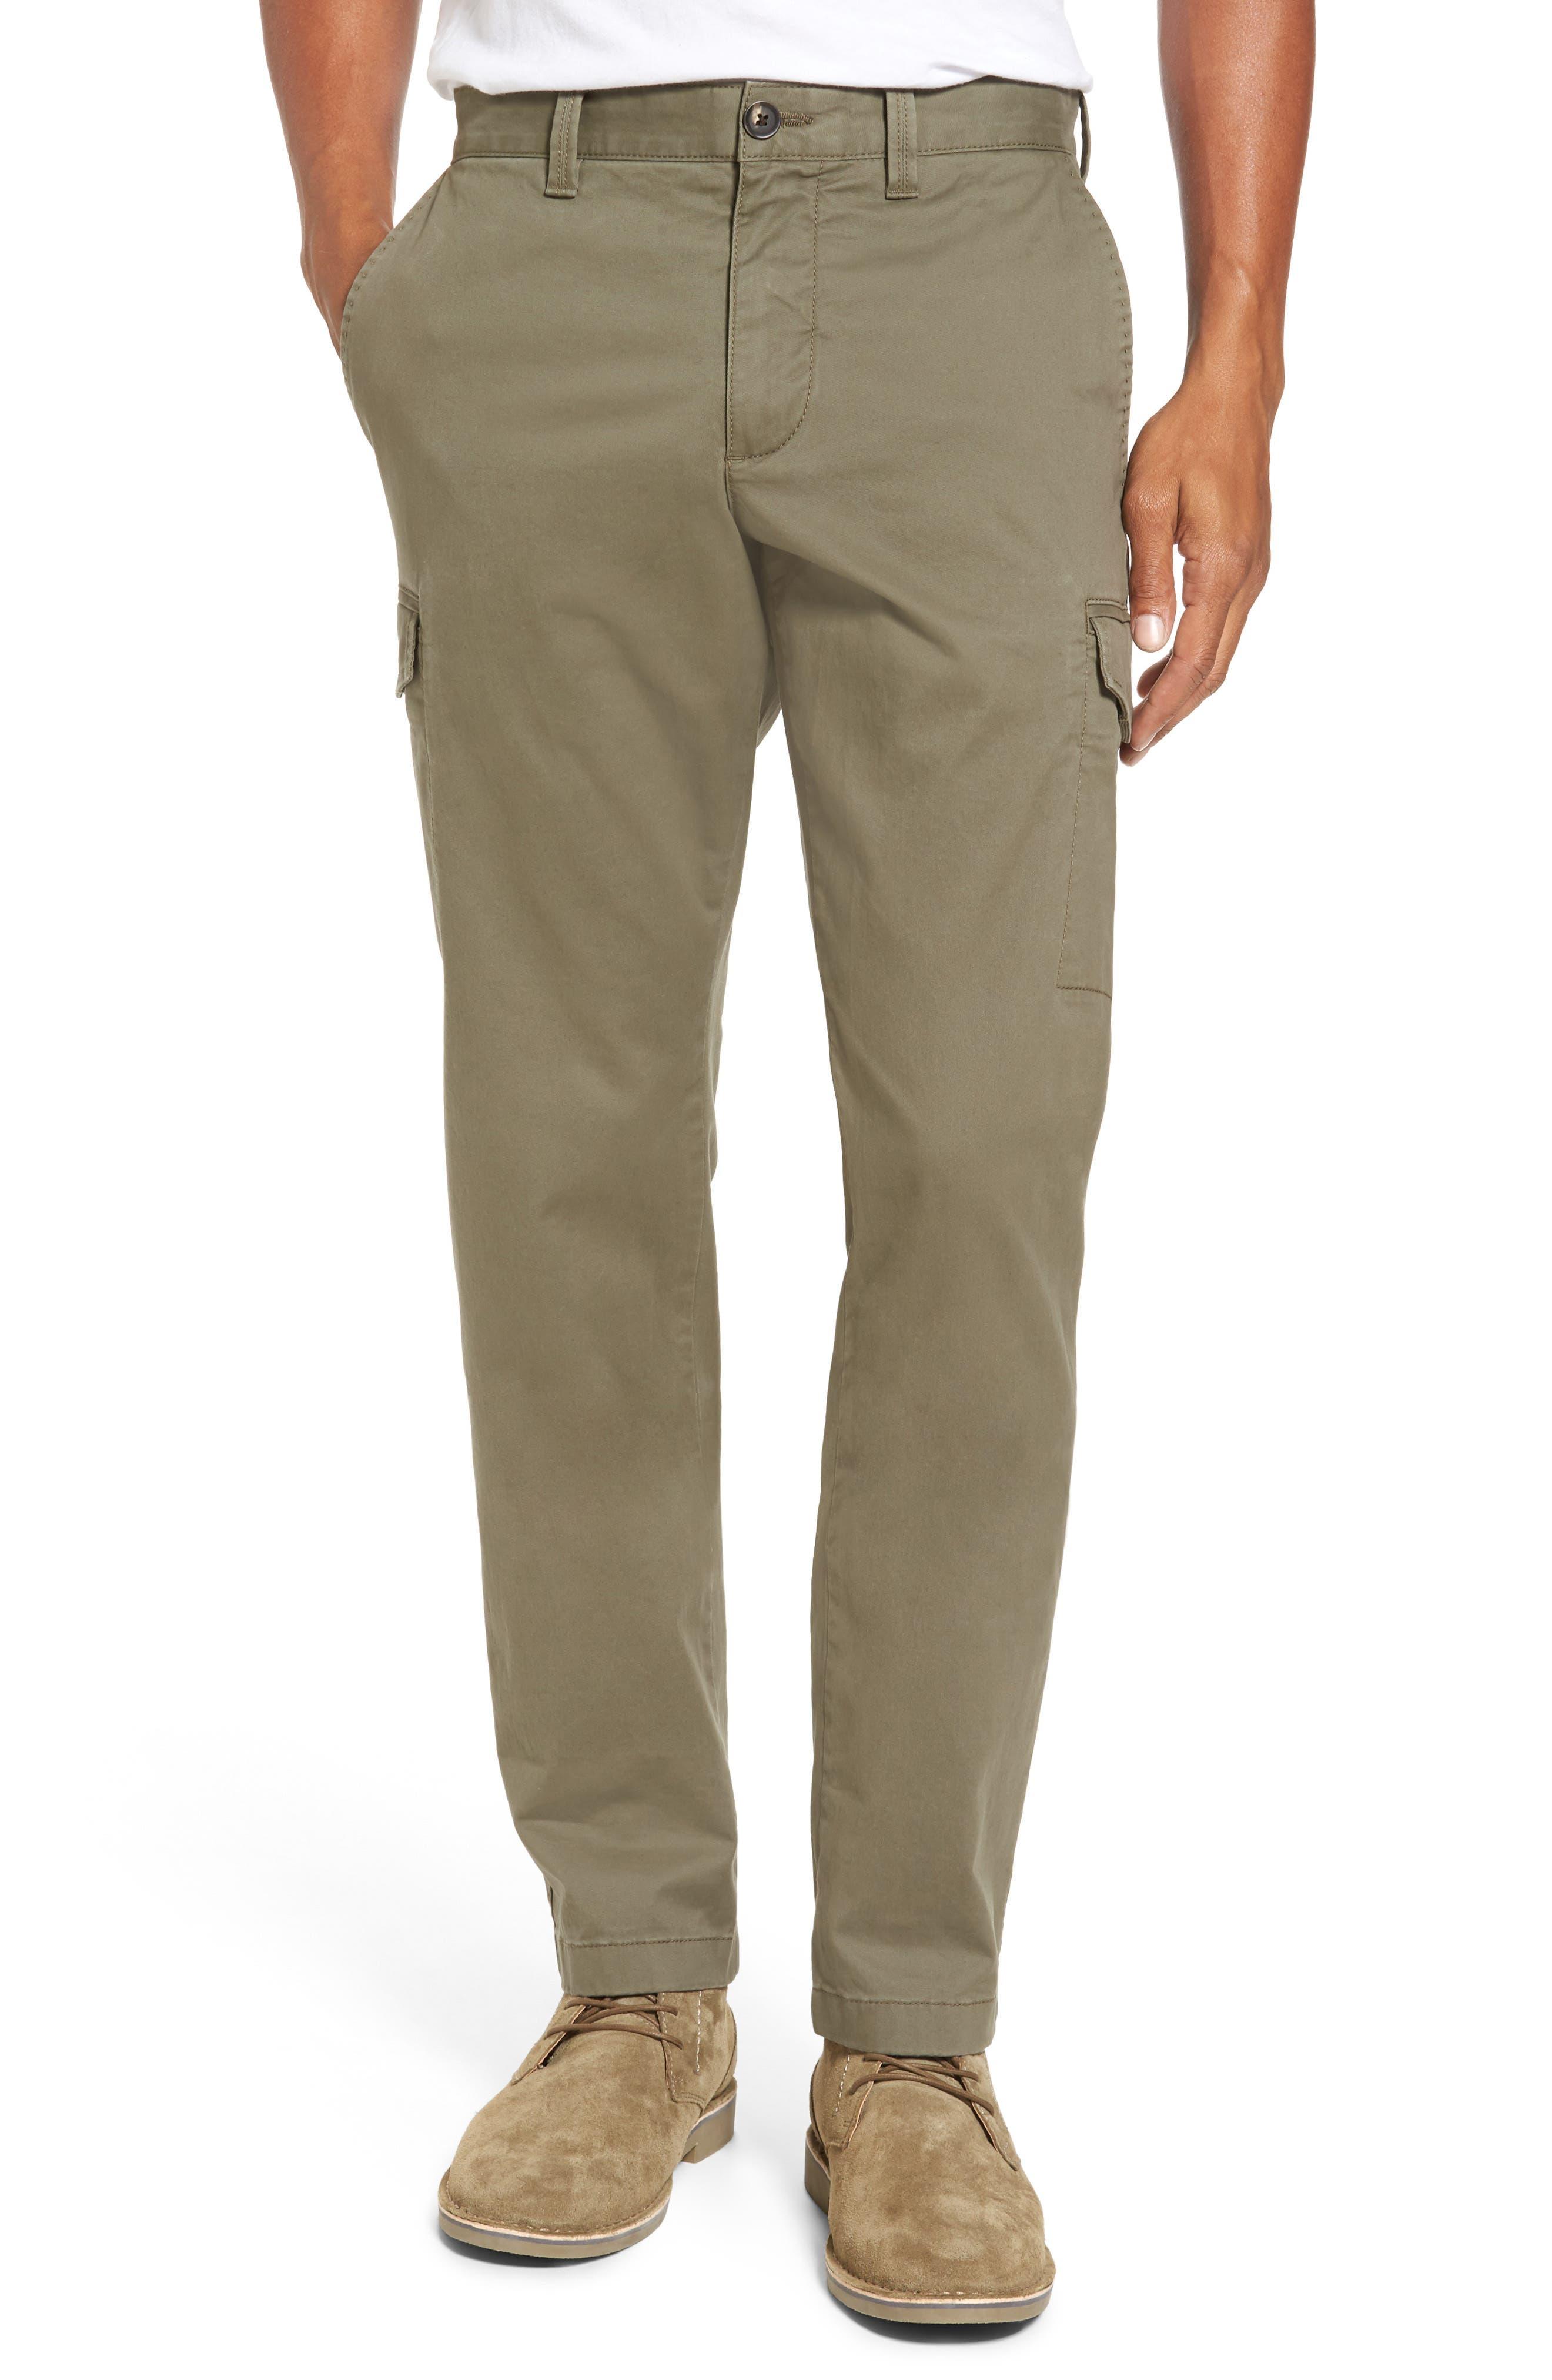 Nordstrom Men's Shop Regular Fit Cargo Pants